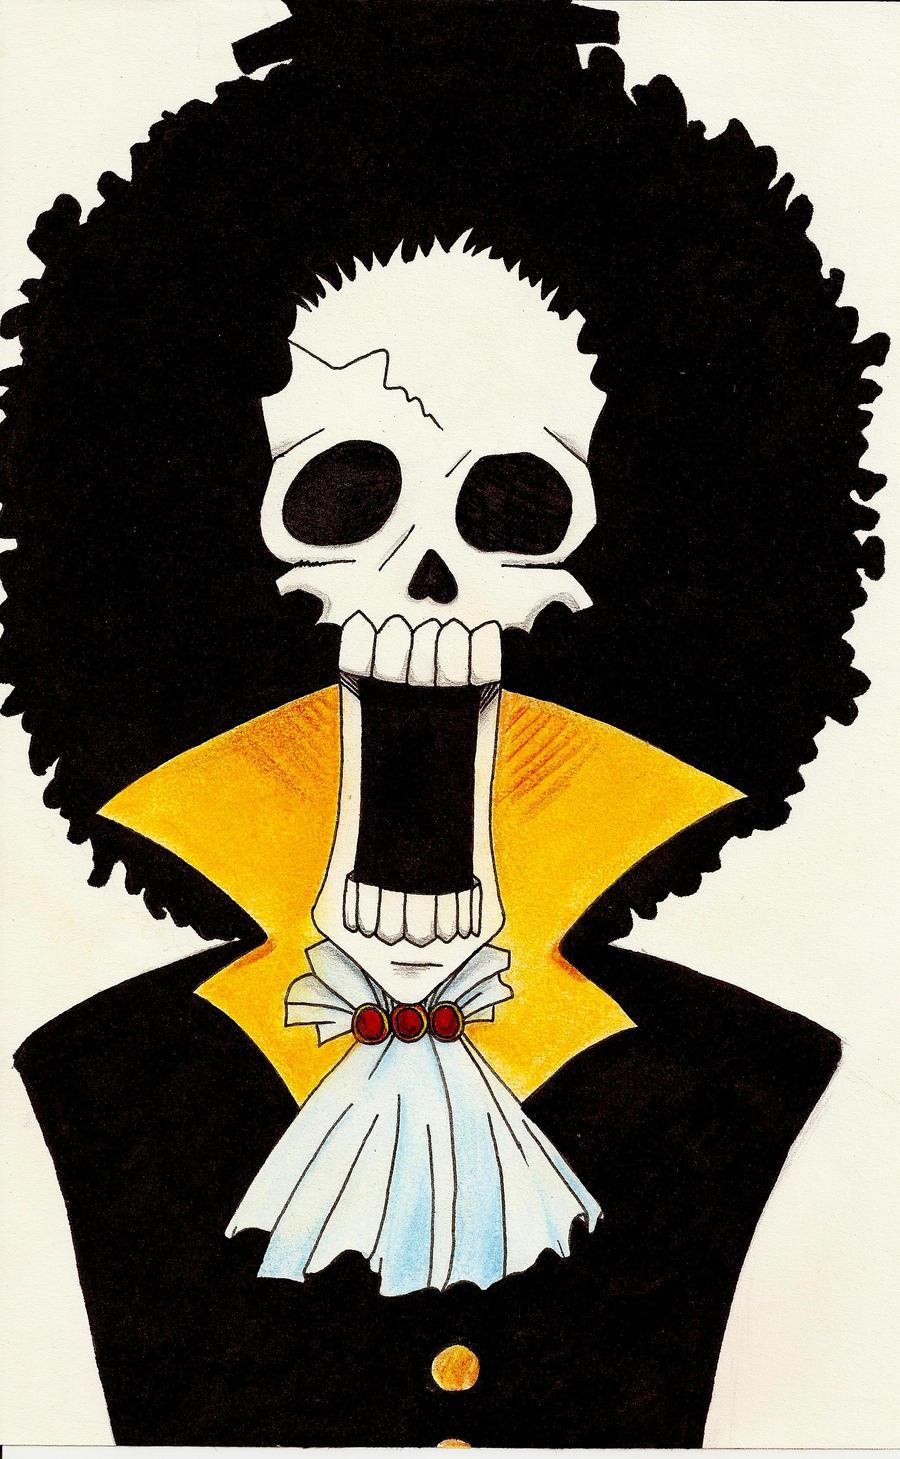 Brook from One Piece by Canardoux on DeviantArt